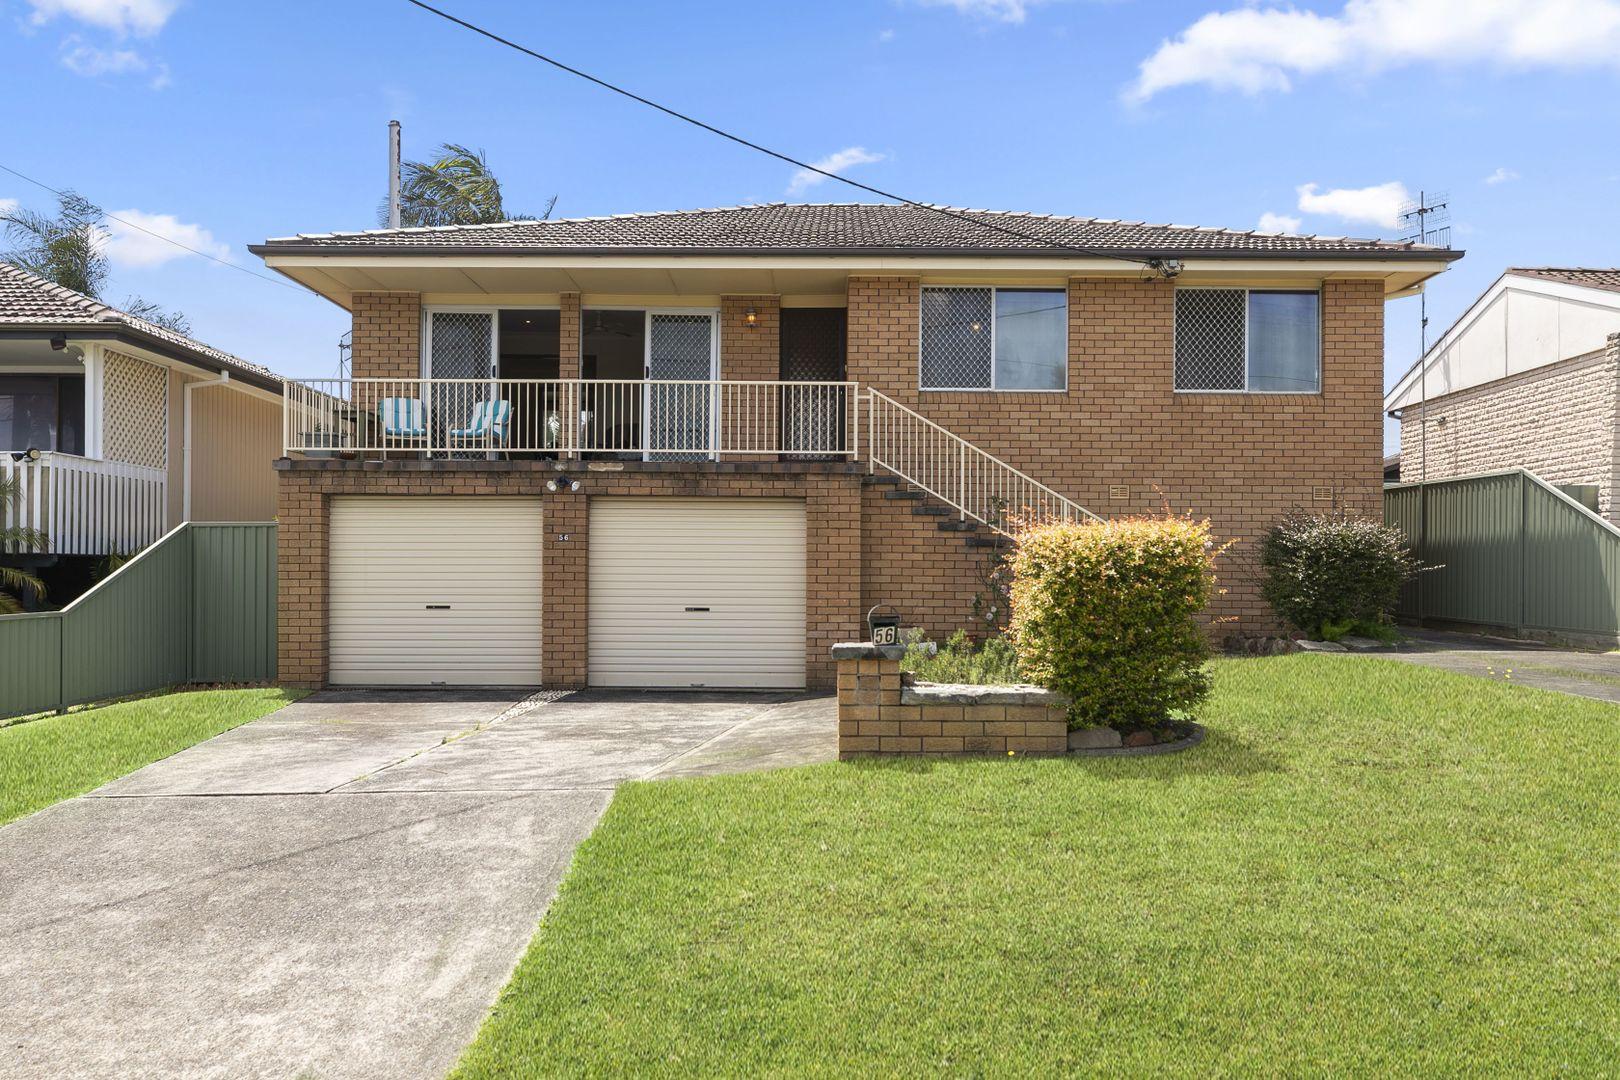 56 MacArthur Street, Killarney Vale NSW 2261, Image 0